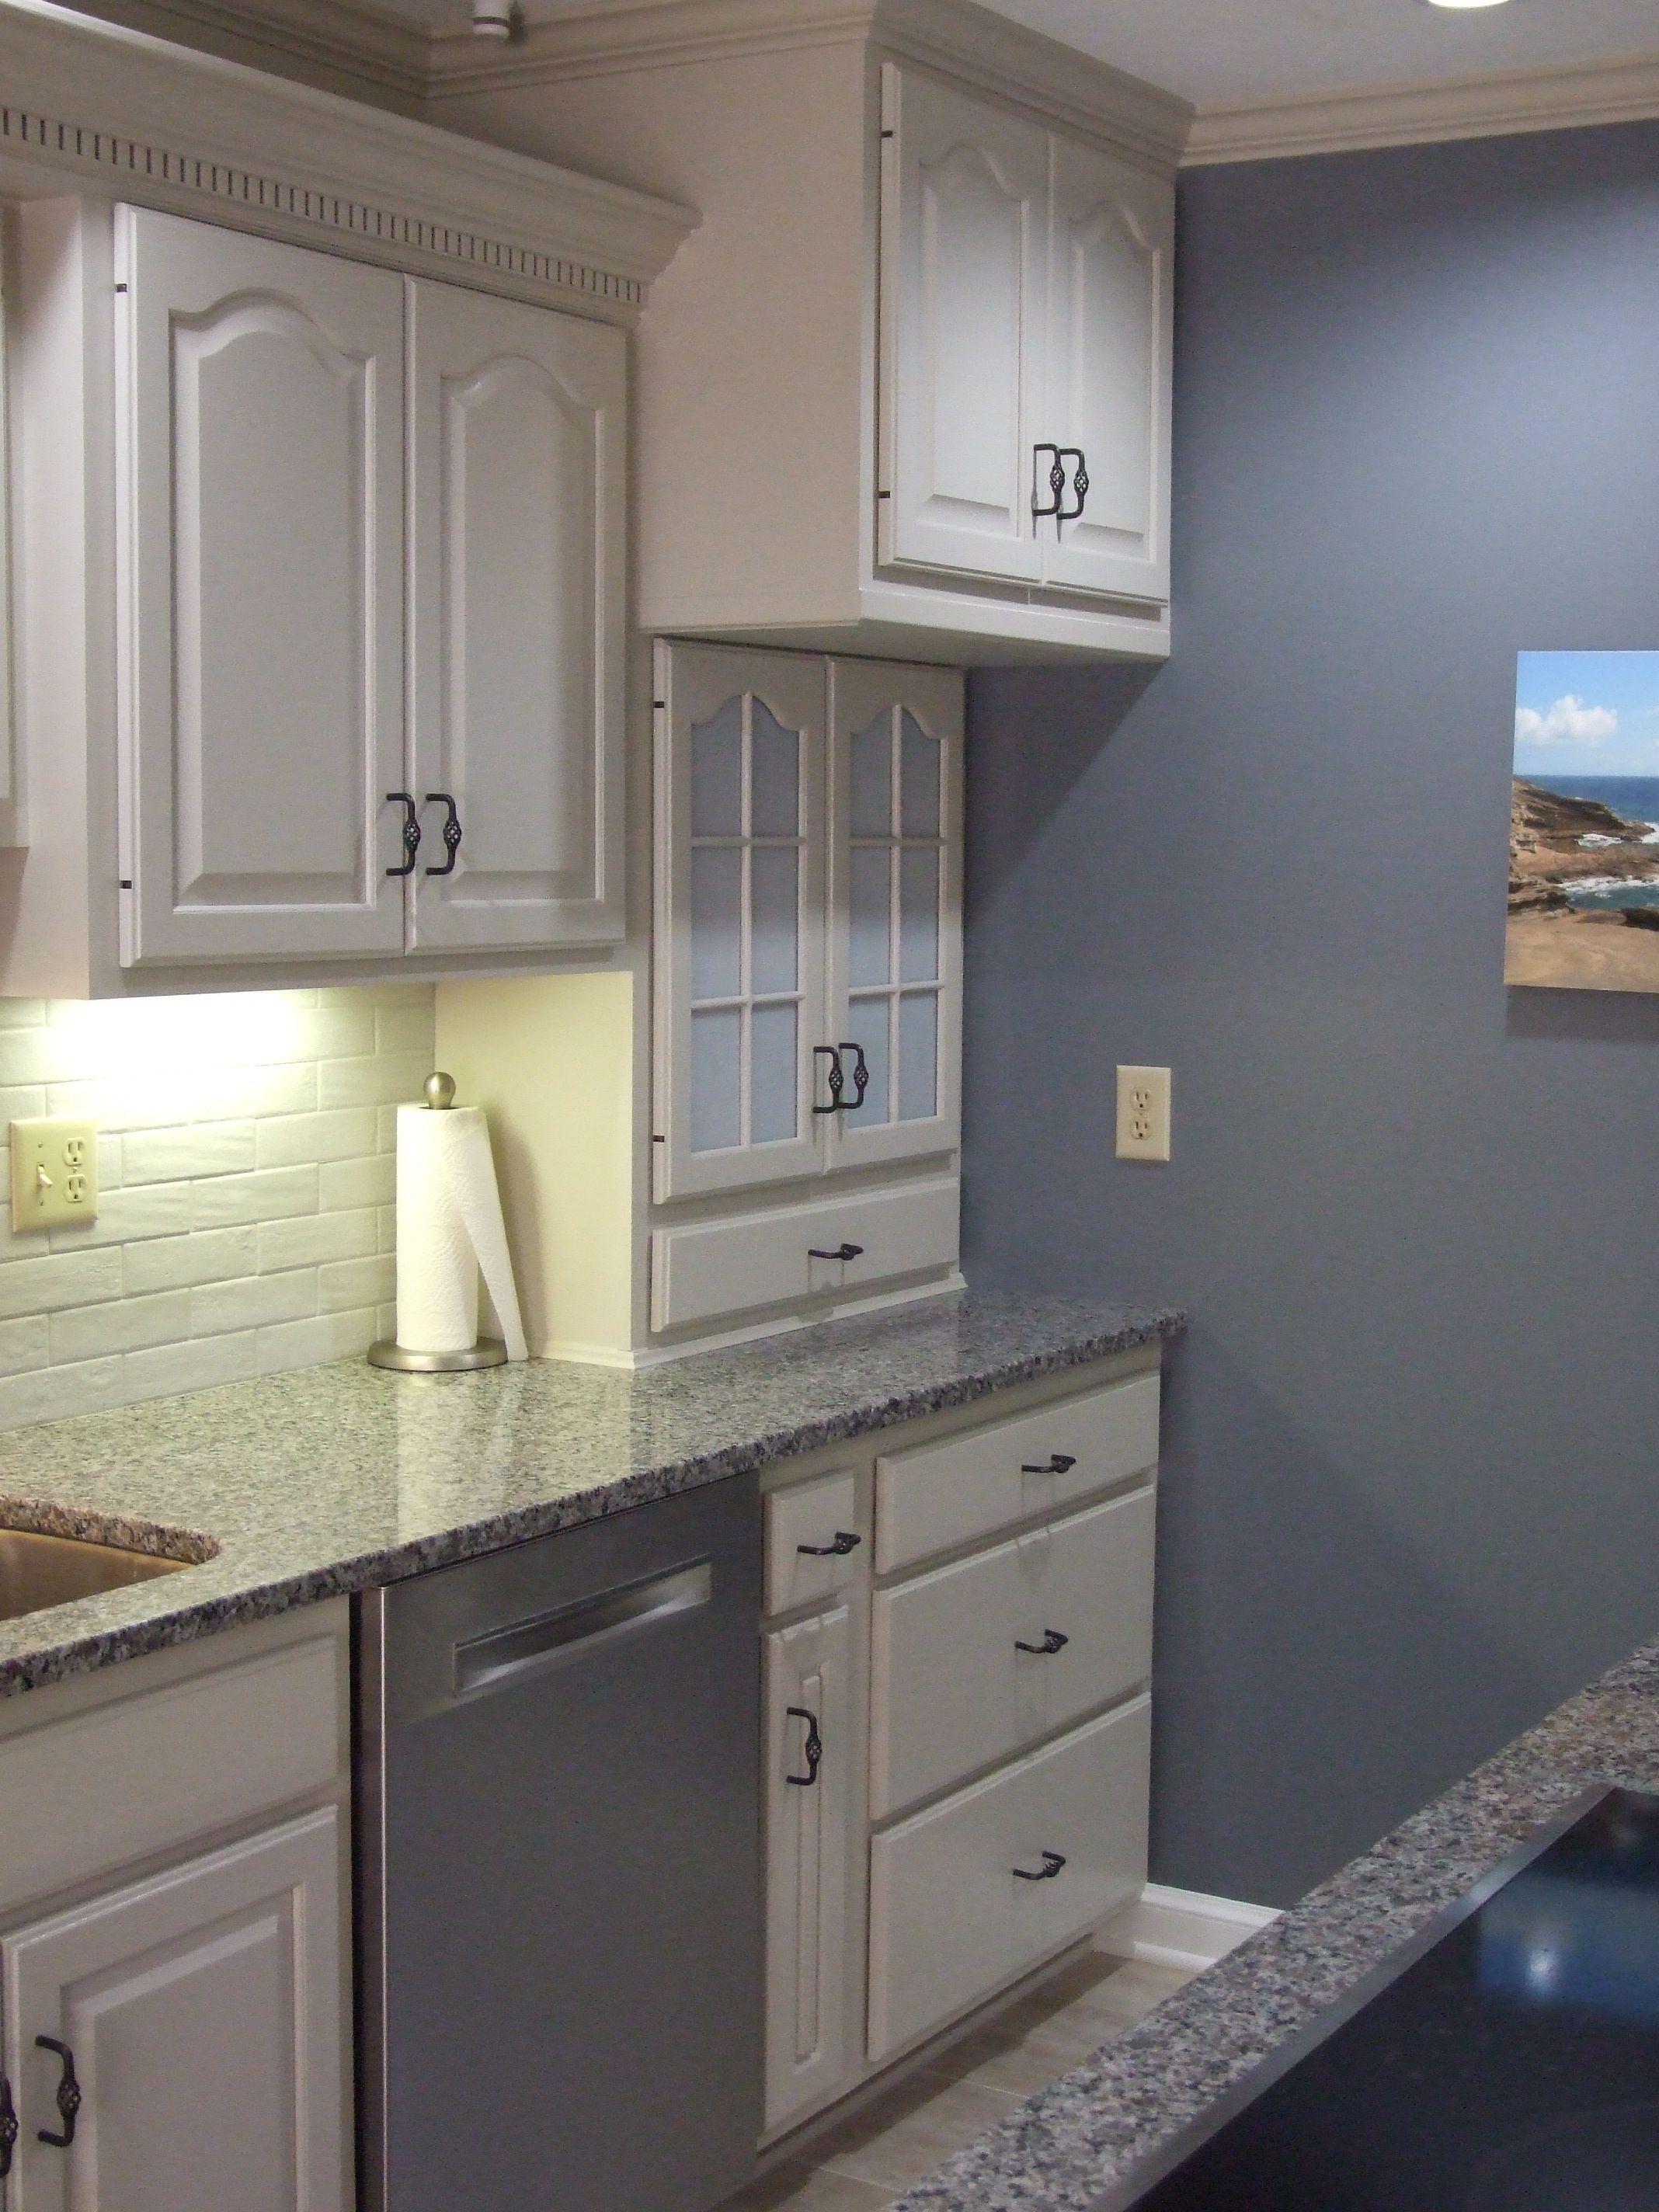 Oak Cabinets Reborn In 2020 Kitchen Remodel Oak Cabinets Updated Kitchen